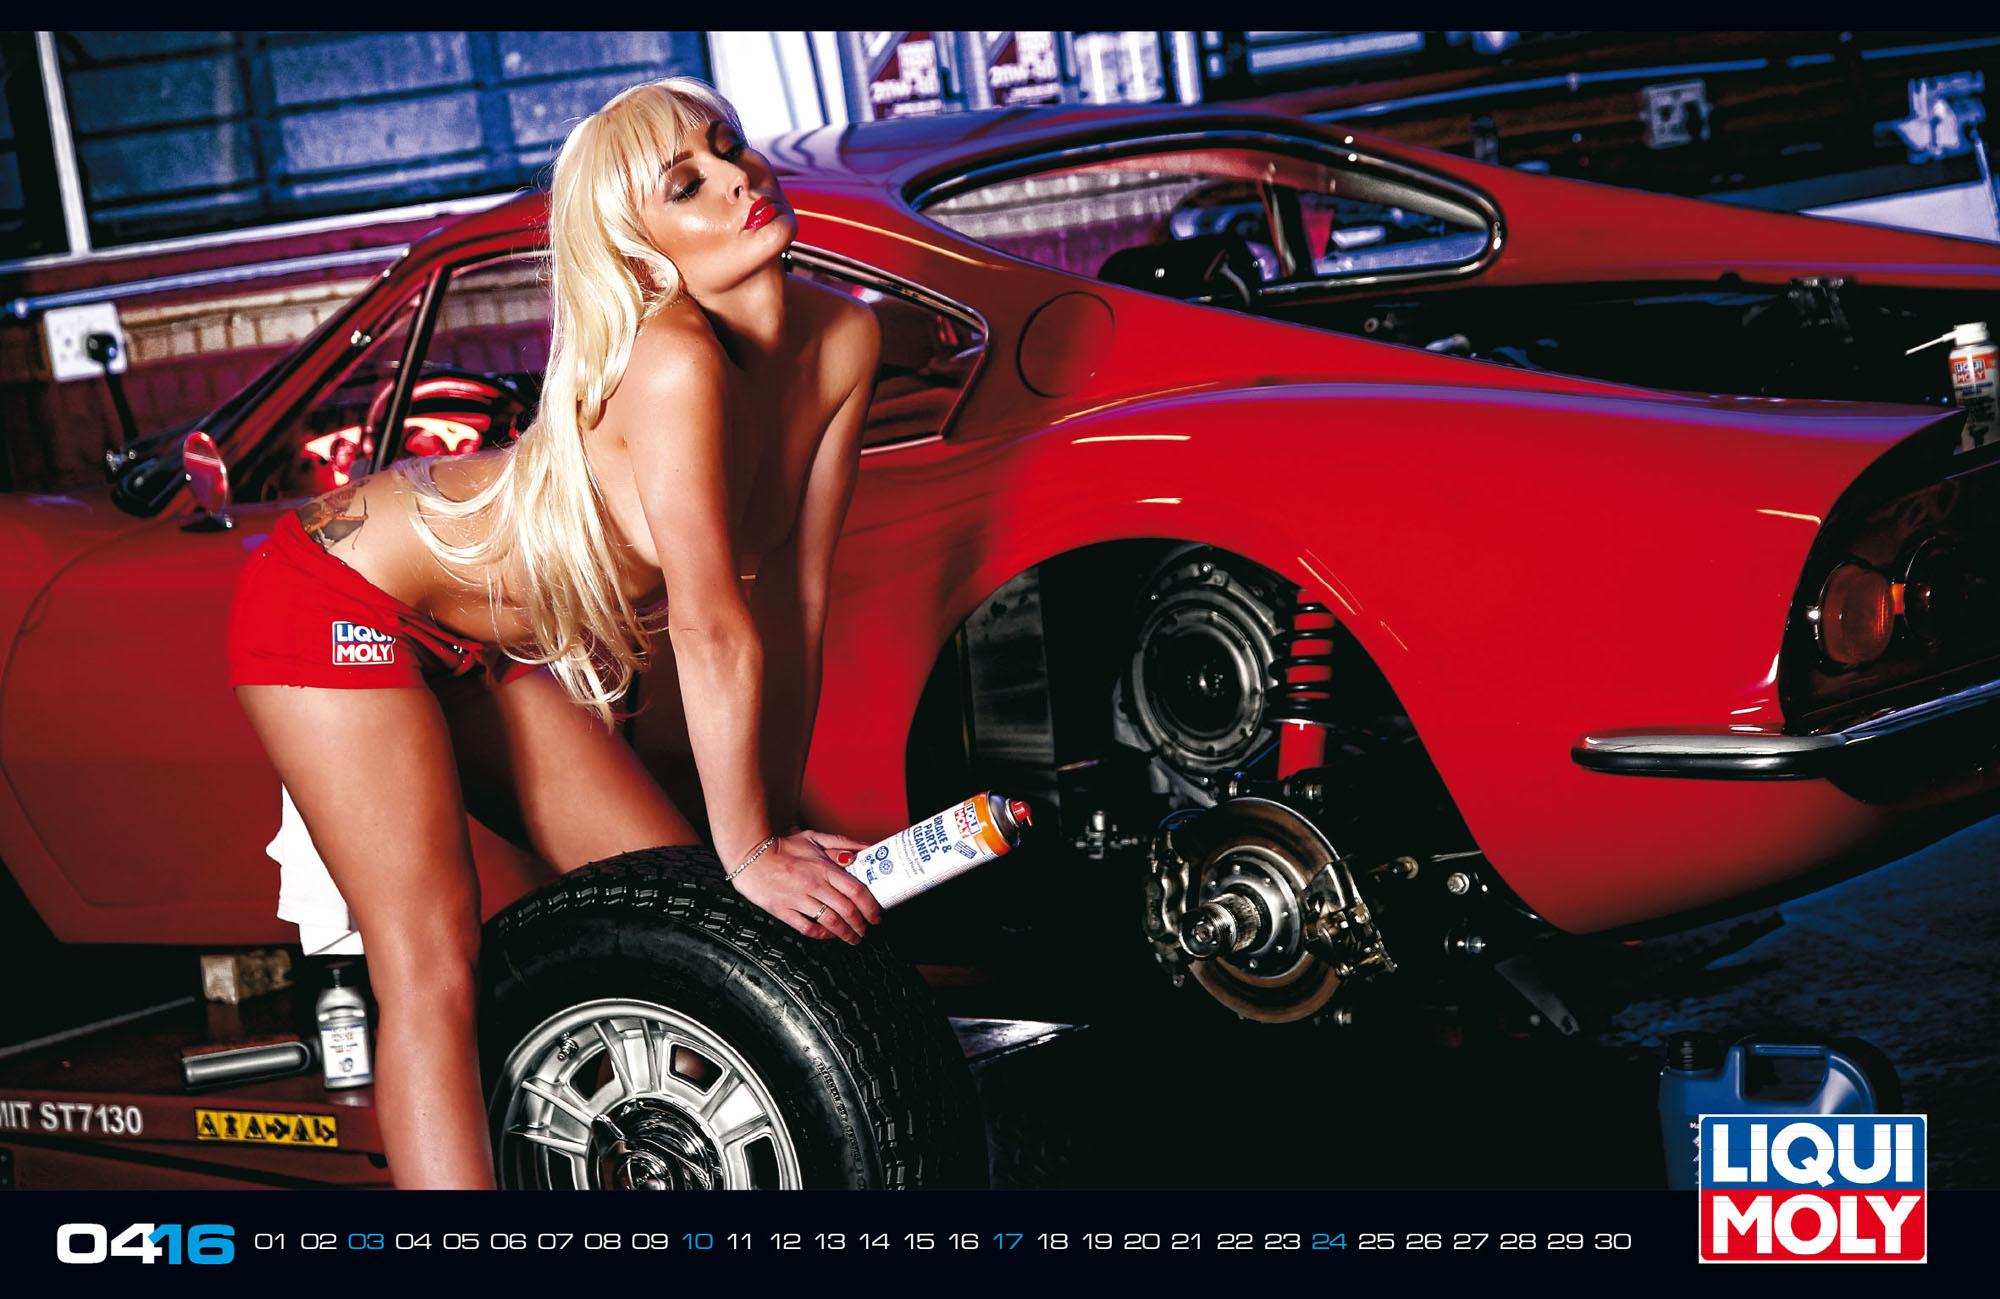 Nenas y Naves… edición especial Calendario HOT 2016 (WOW)